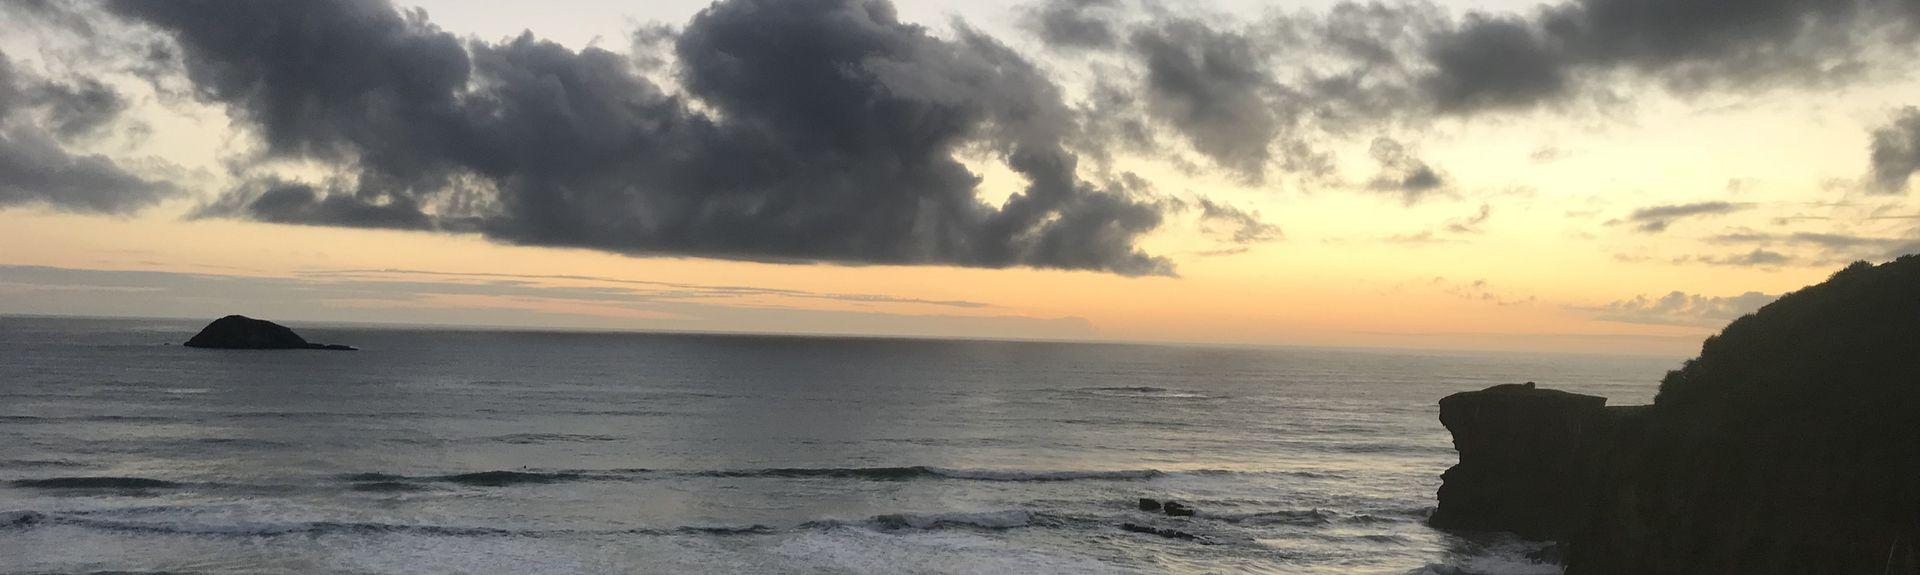 Karekare Beach, Karekare, North Island, New Zealand